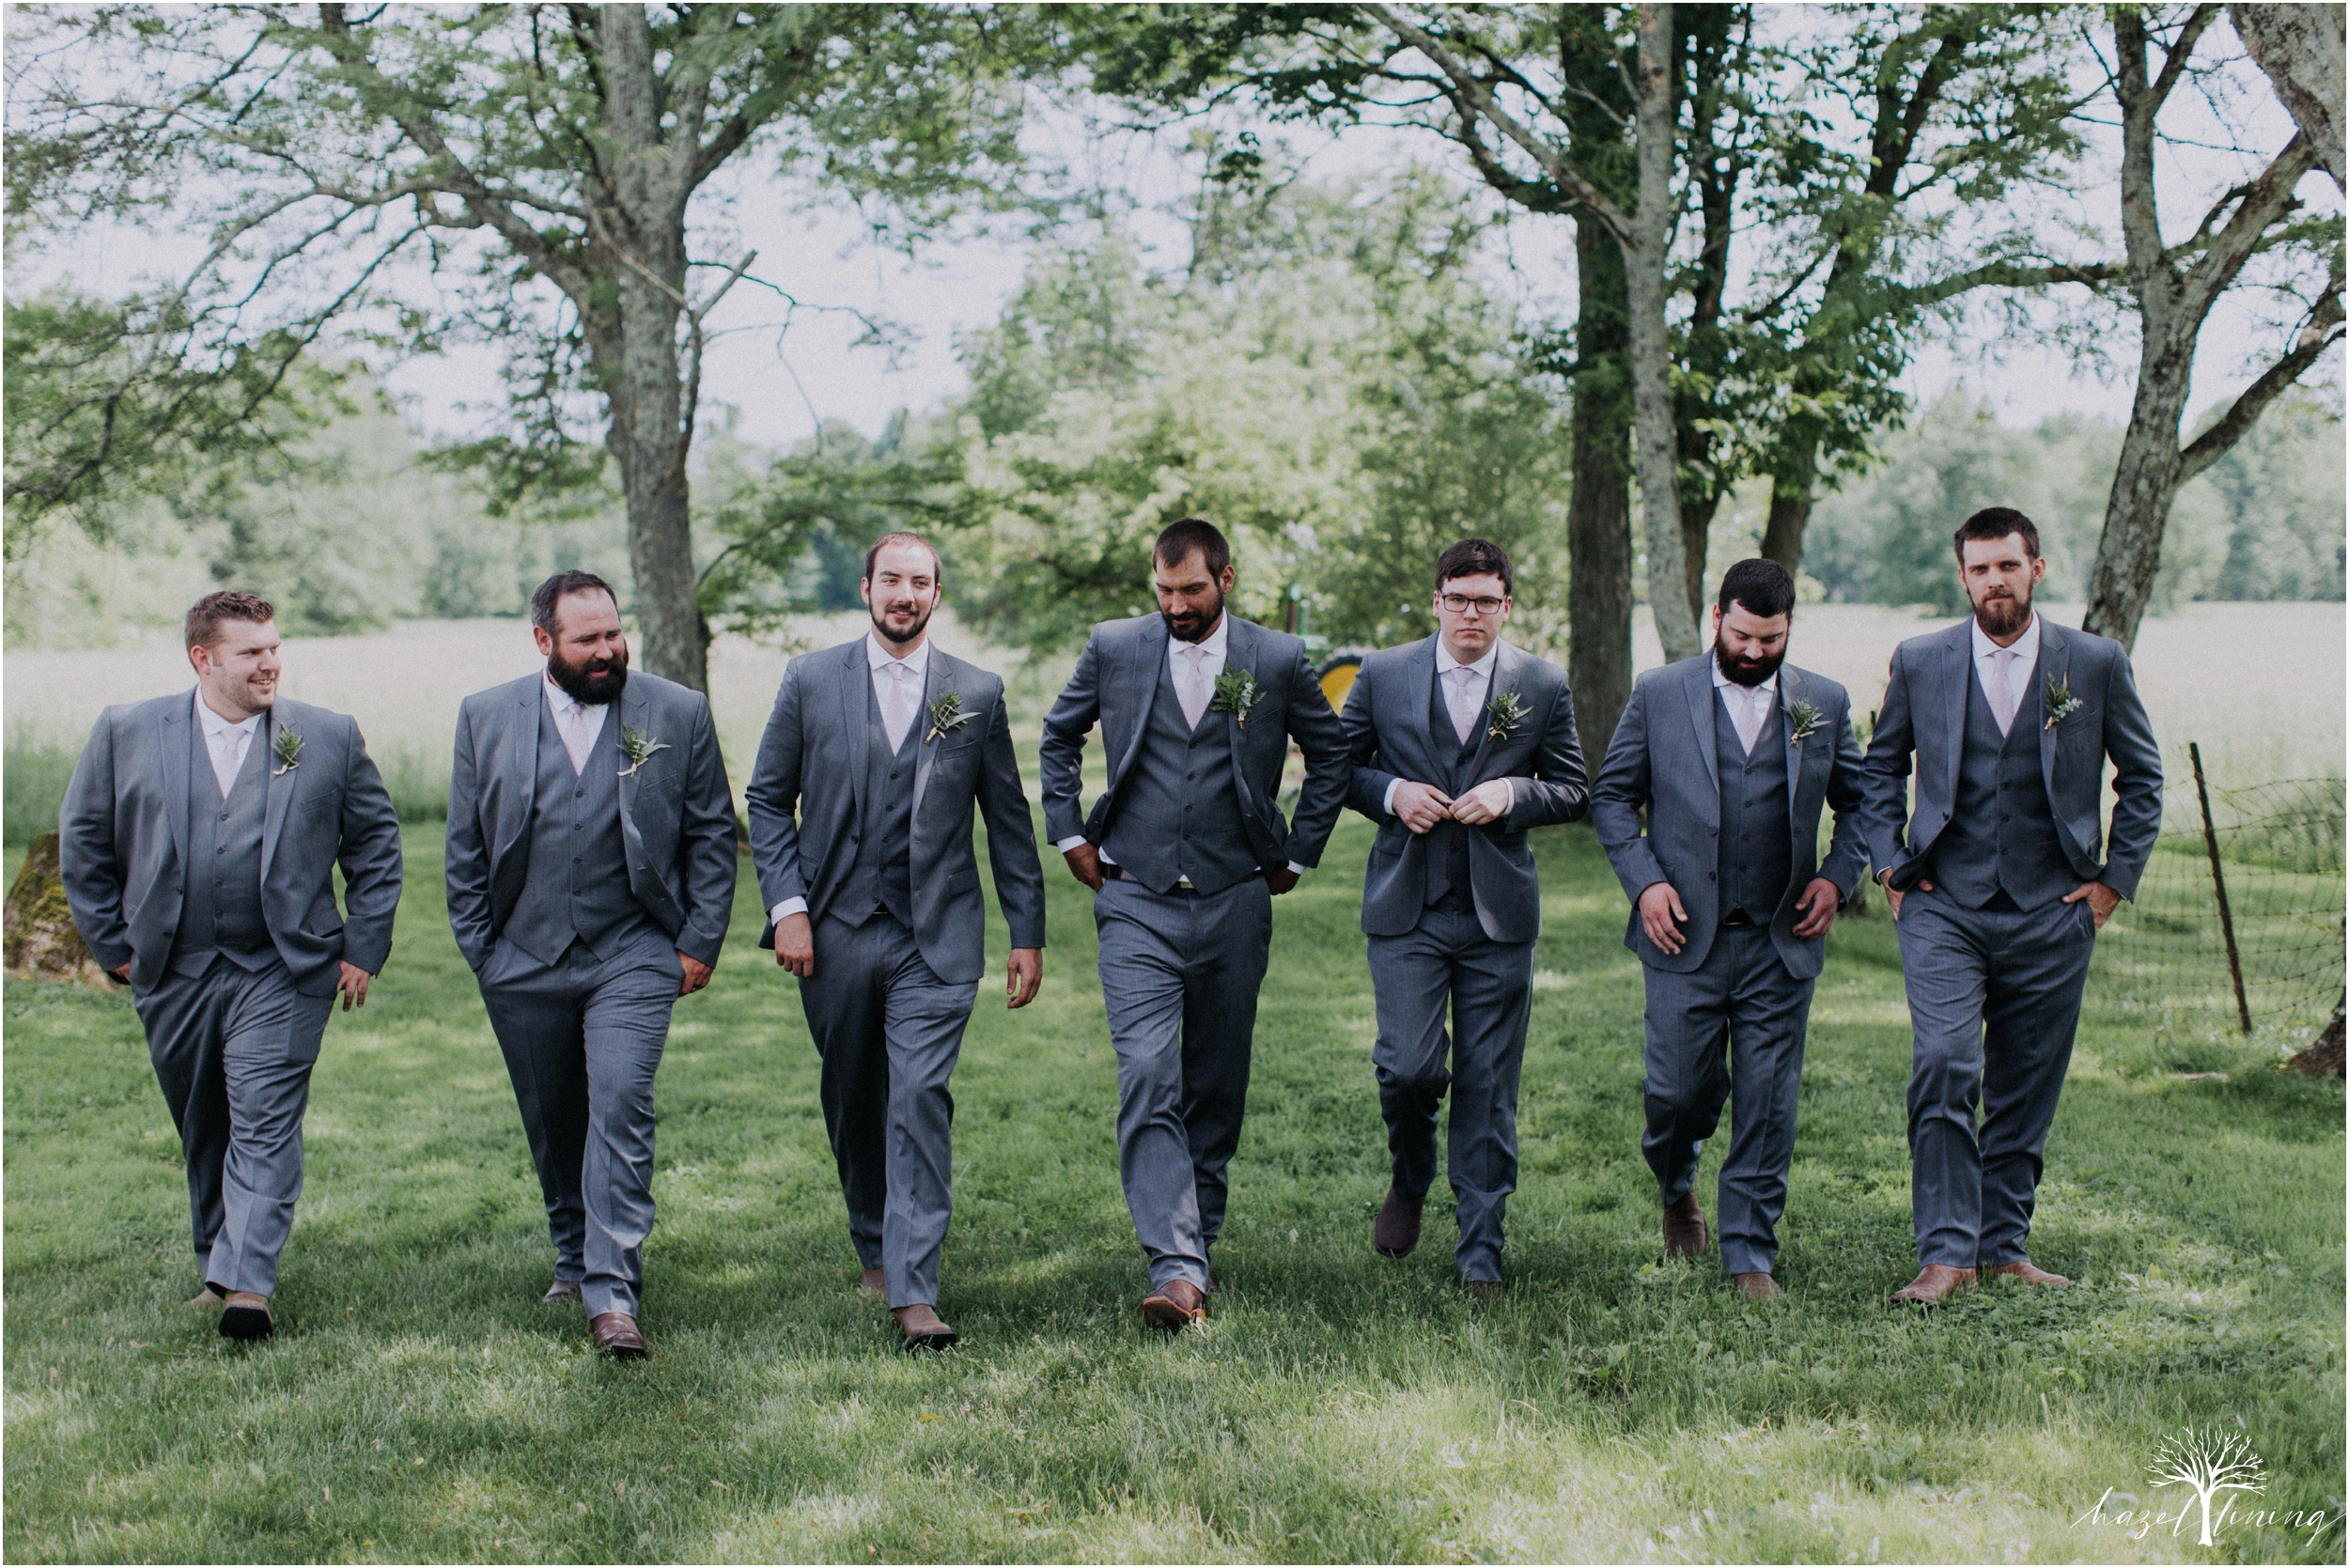 hazel-lining-travel-wedding-elopement-photography-lisa-landon-shoemaker-the-farm-bakery-and-events-bucks-county-quakertown-pennsylvania-summer-country-outdoor-farm-wedding_0049.jpg